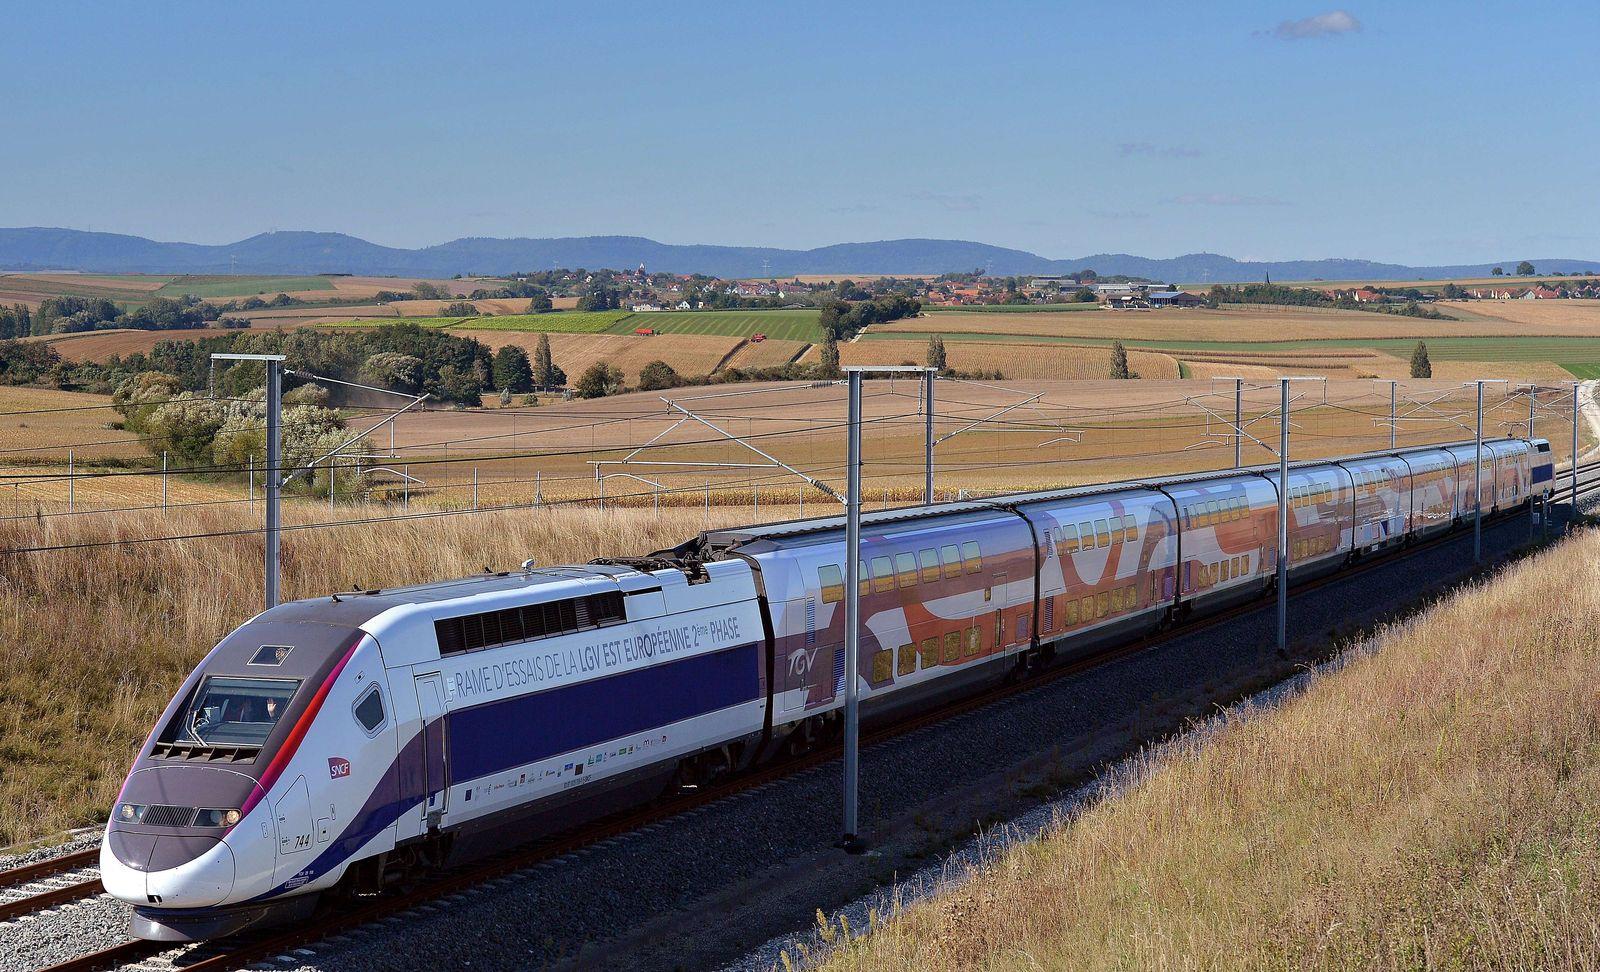 FRANCE-TRANSPORT-RAILWAY-LGV